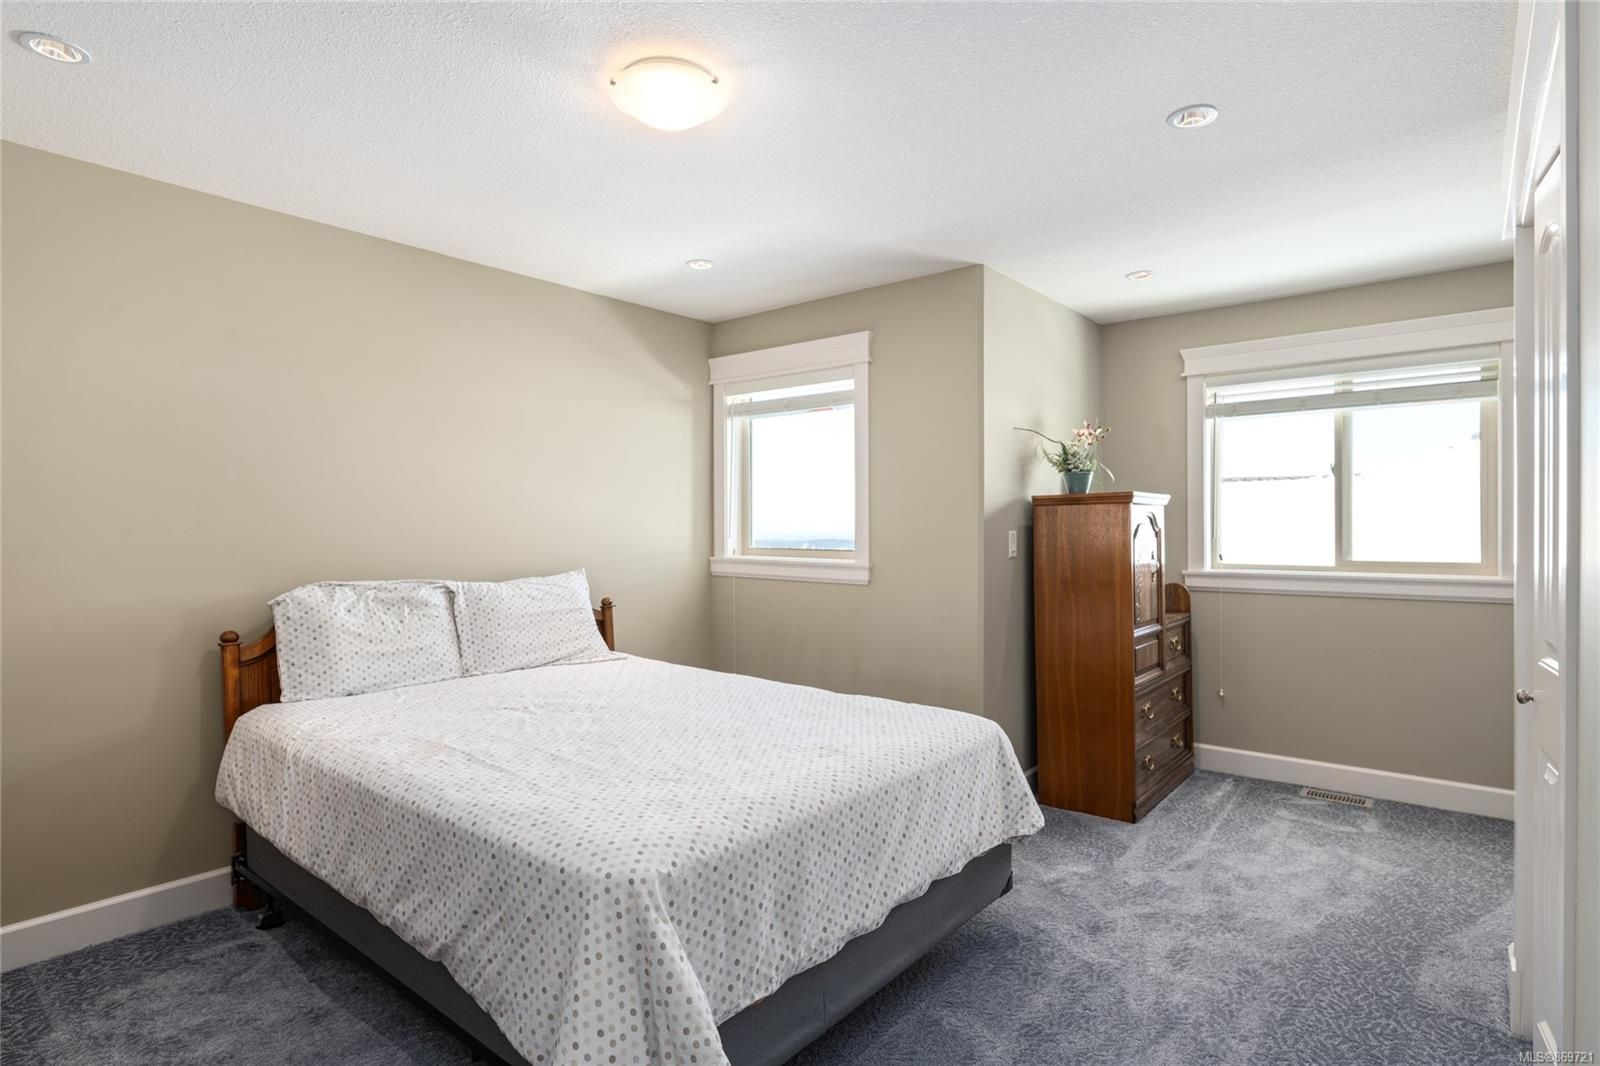 Photo 21: Photos: 2259 Leighton Rd in : Na South Jingle Pot House for sale (Nanaimo)  : MLS®# 869721